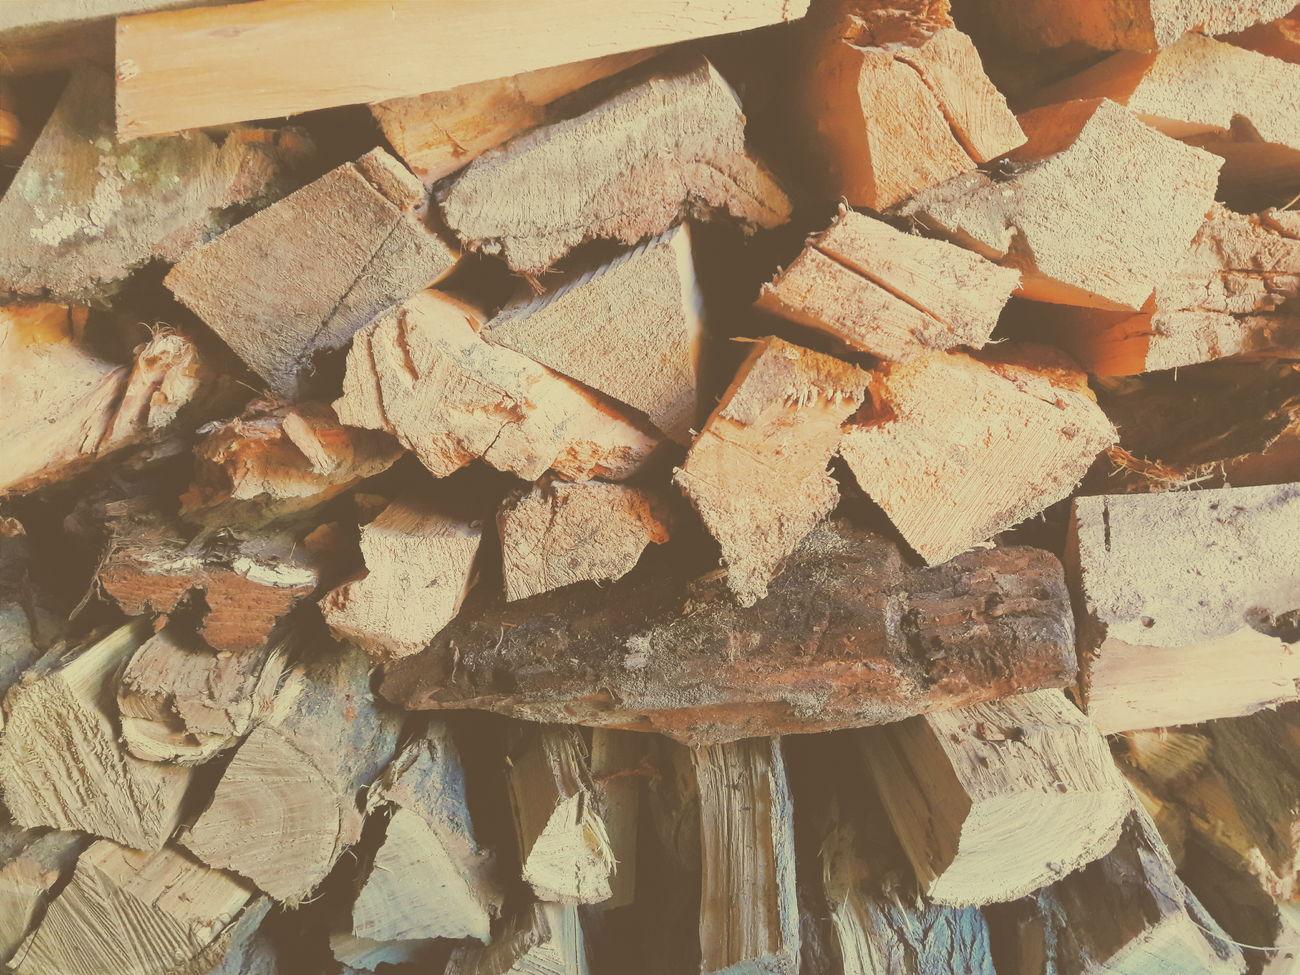 Tumblr Style. Tree дрова EyeEm EyeEm Best Shots Nature Photo Что-же еще 1 фотограф появился на просторах EyeEm First Eyeem Photo